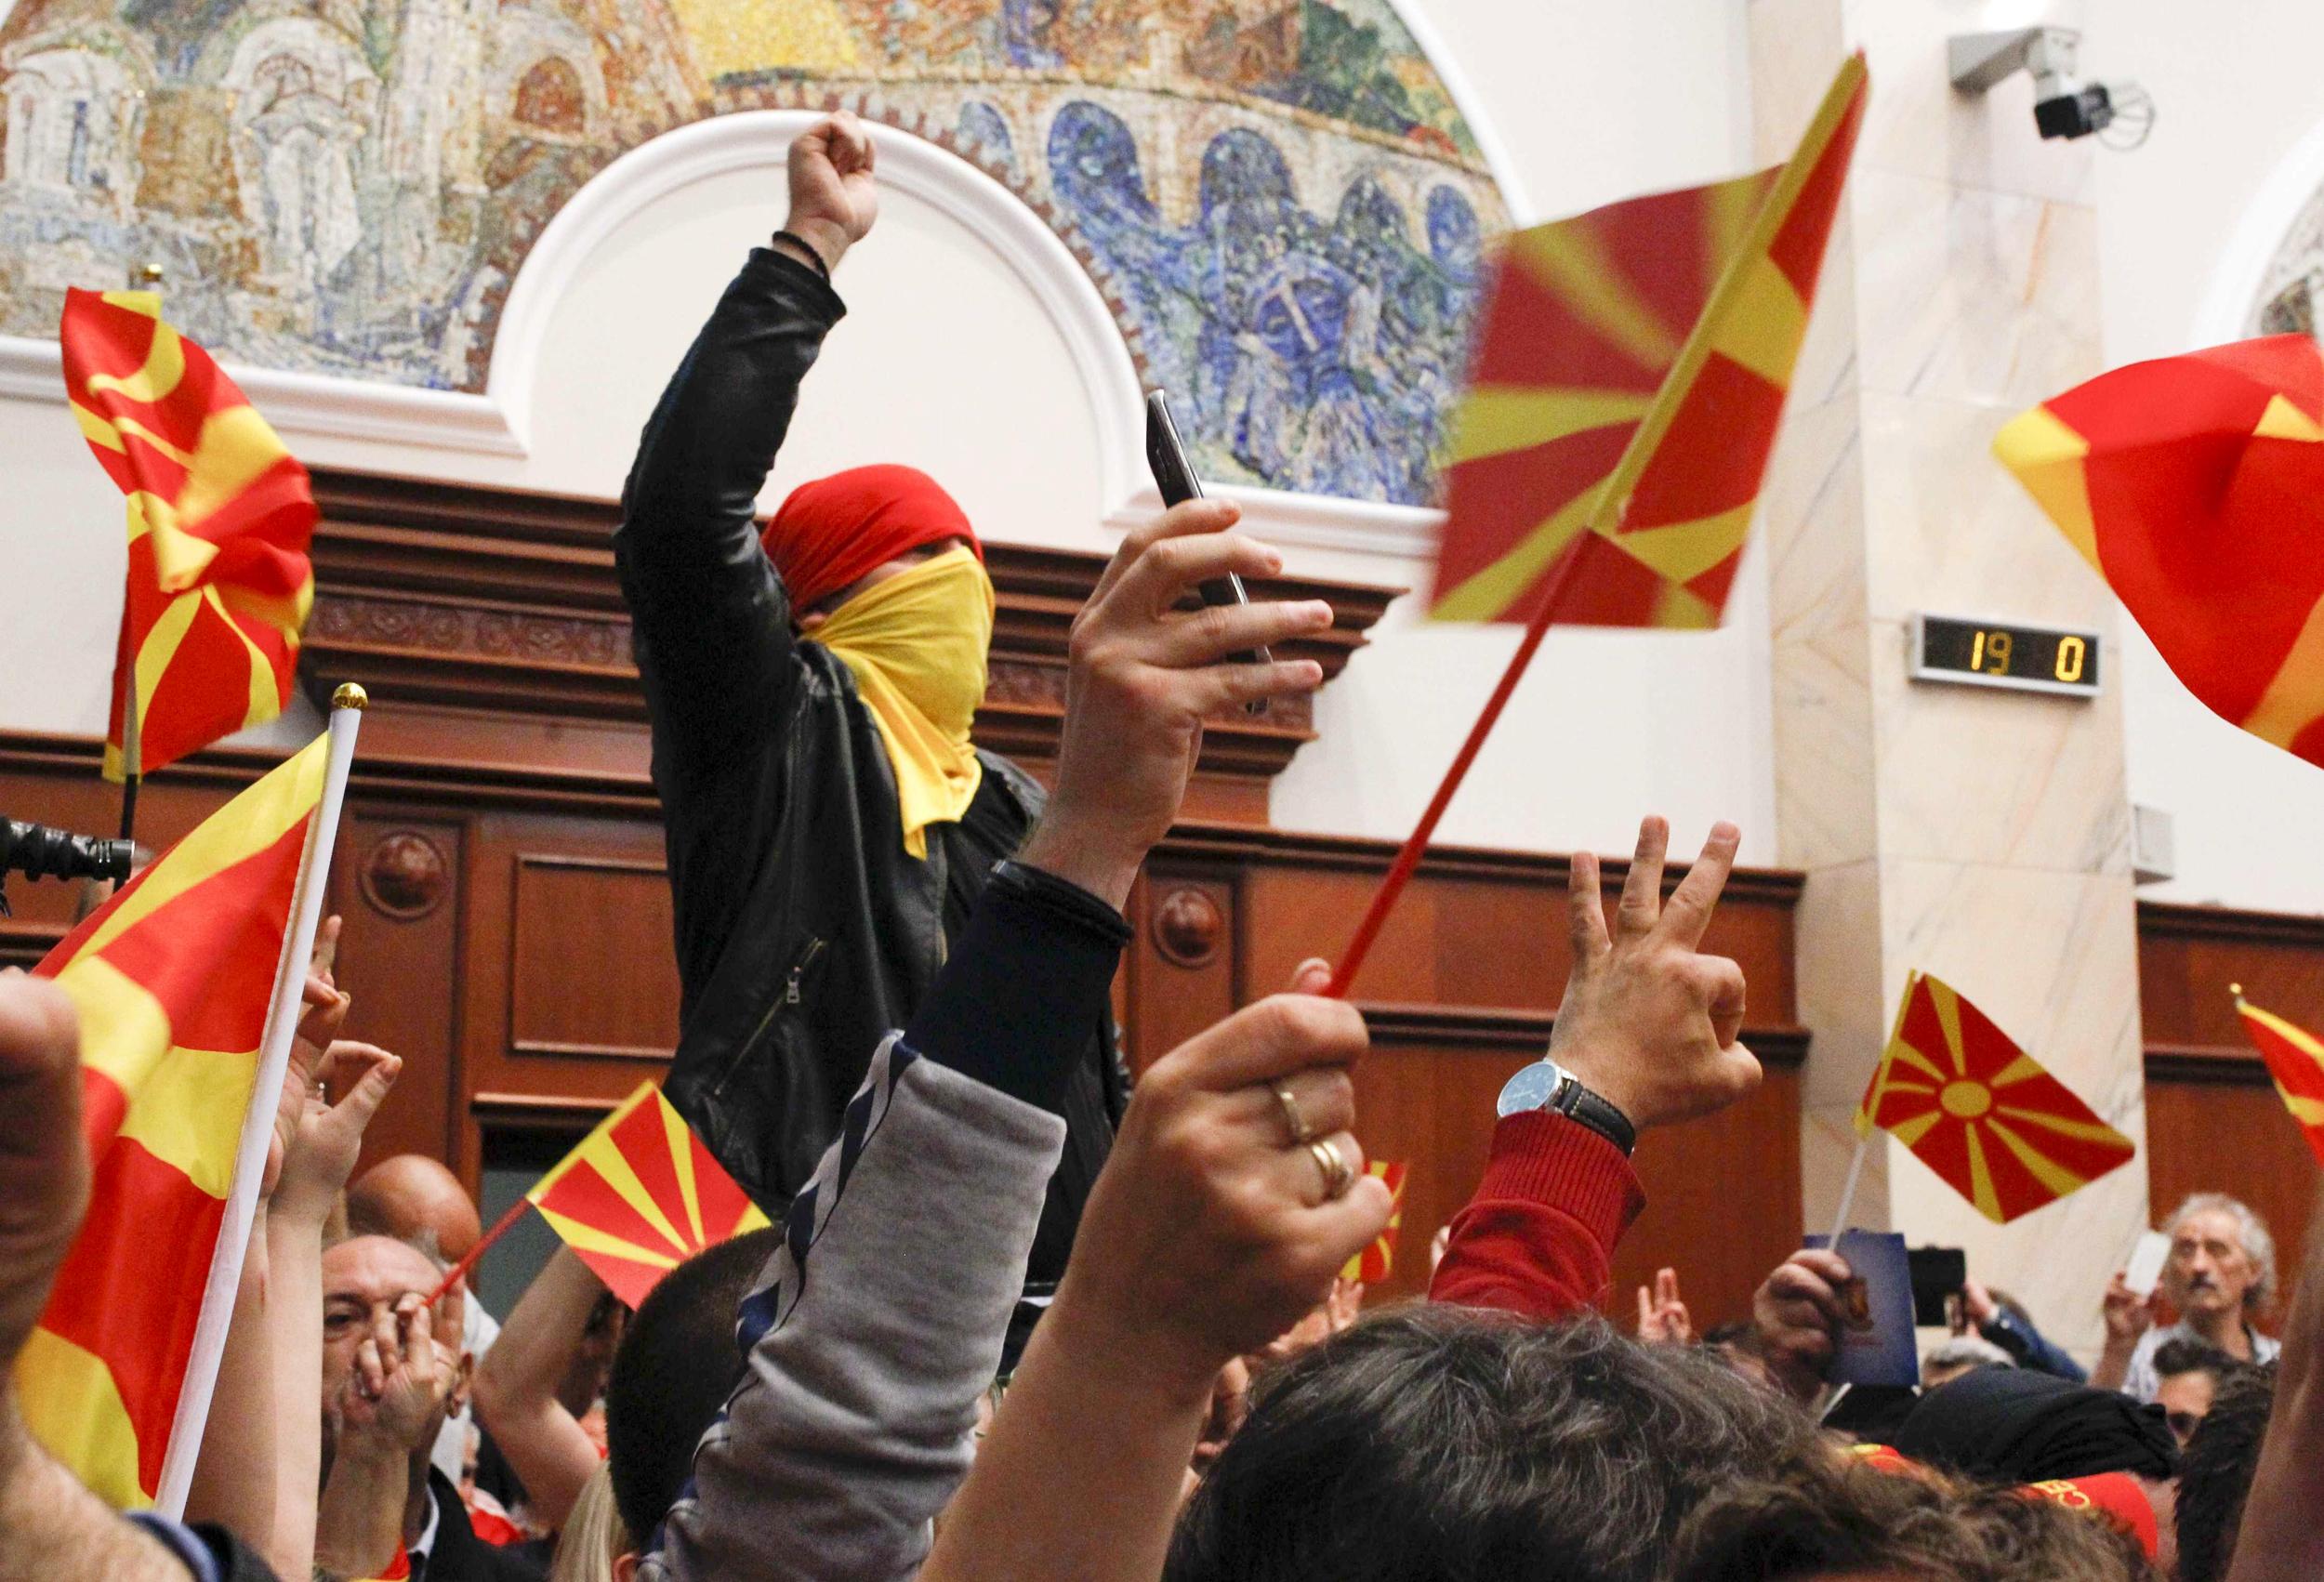 Massive Brawl Engulfs Macedonia's Parliament, 100 Injured